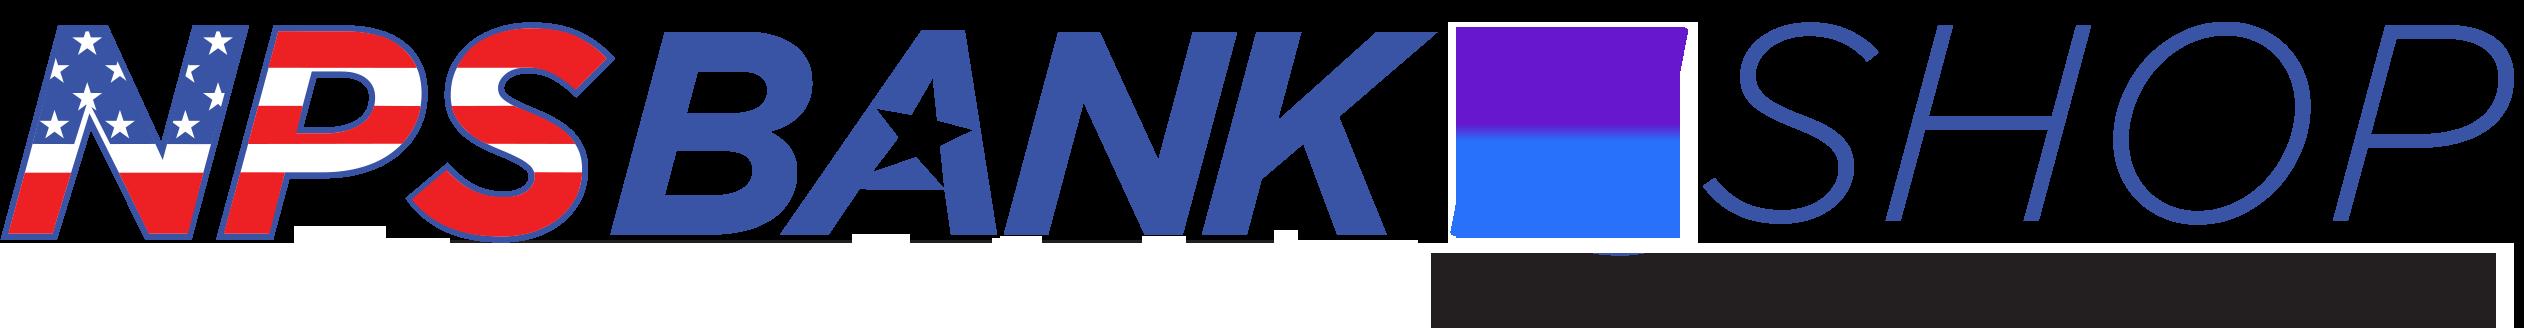 NPSBank Shop